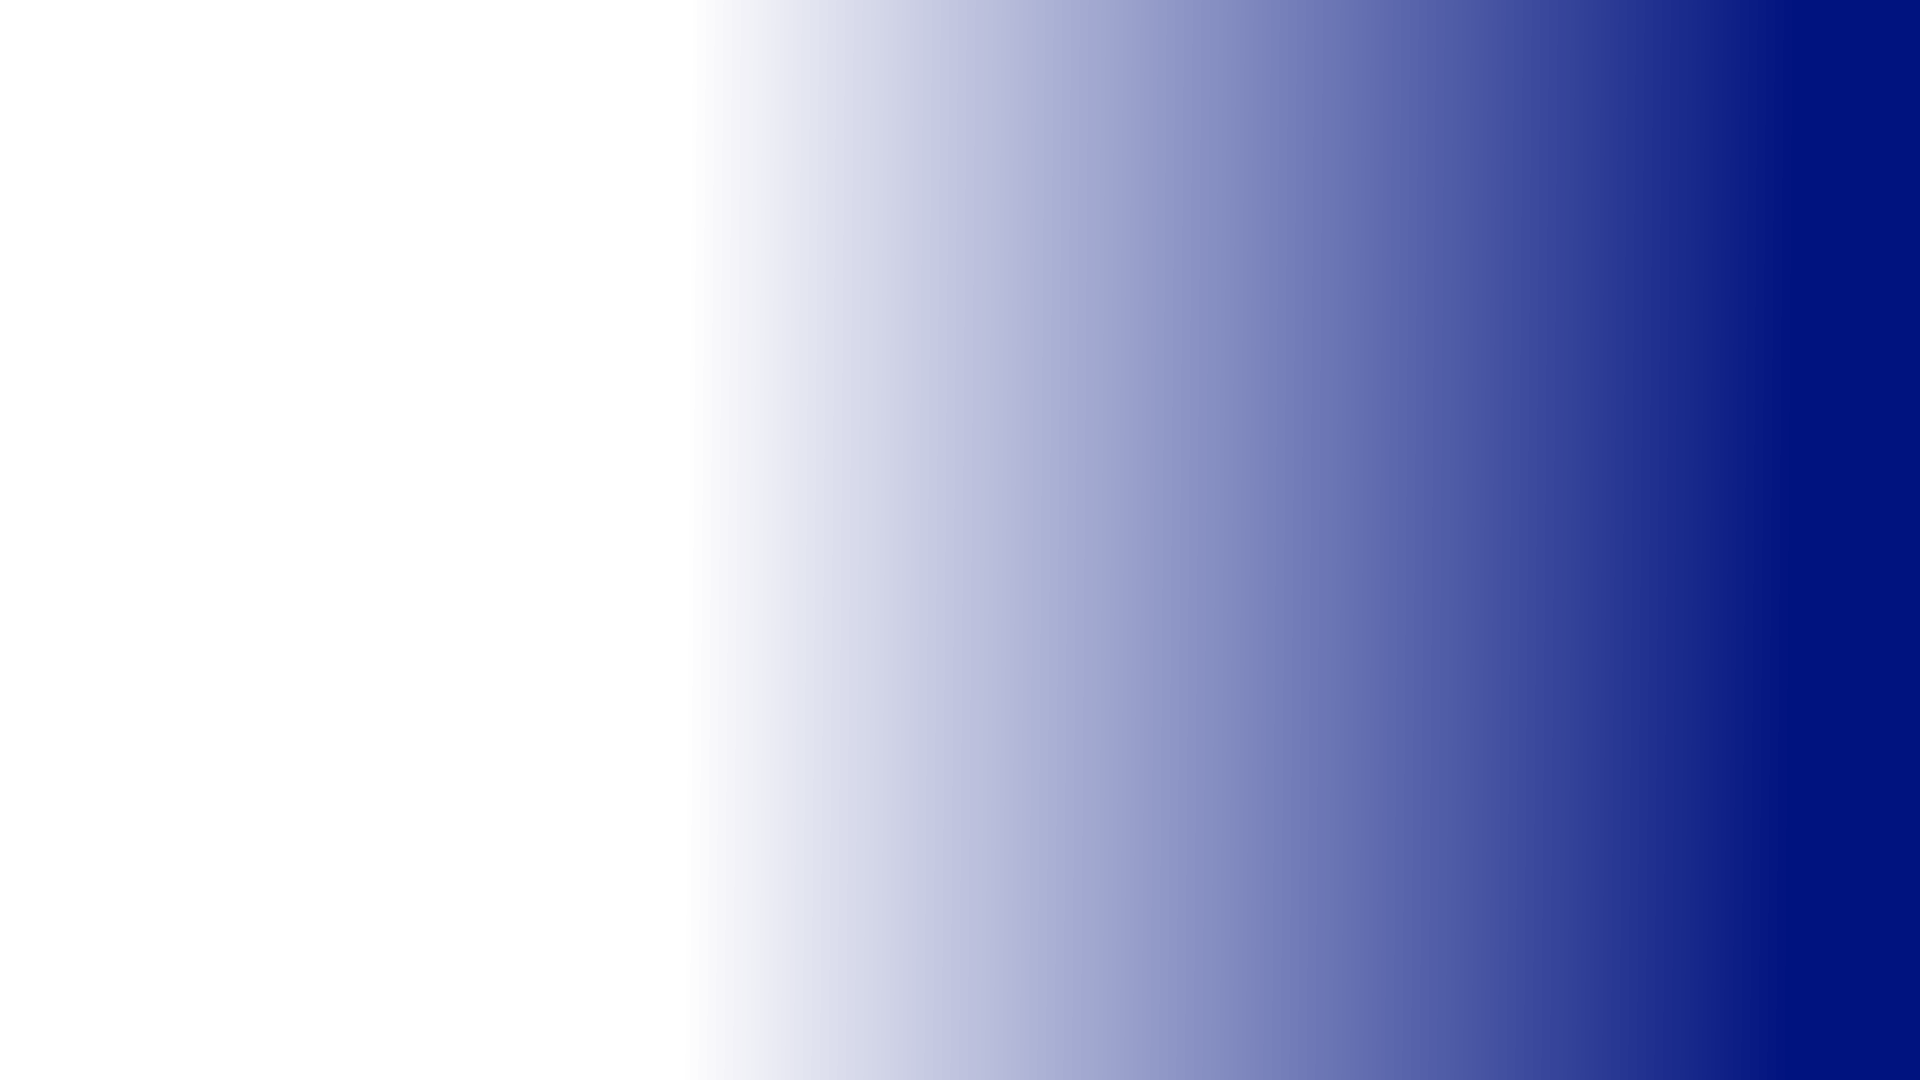 White Vs Blue Desktop Background Wallpaper Png Made In Brum